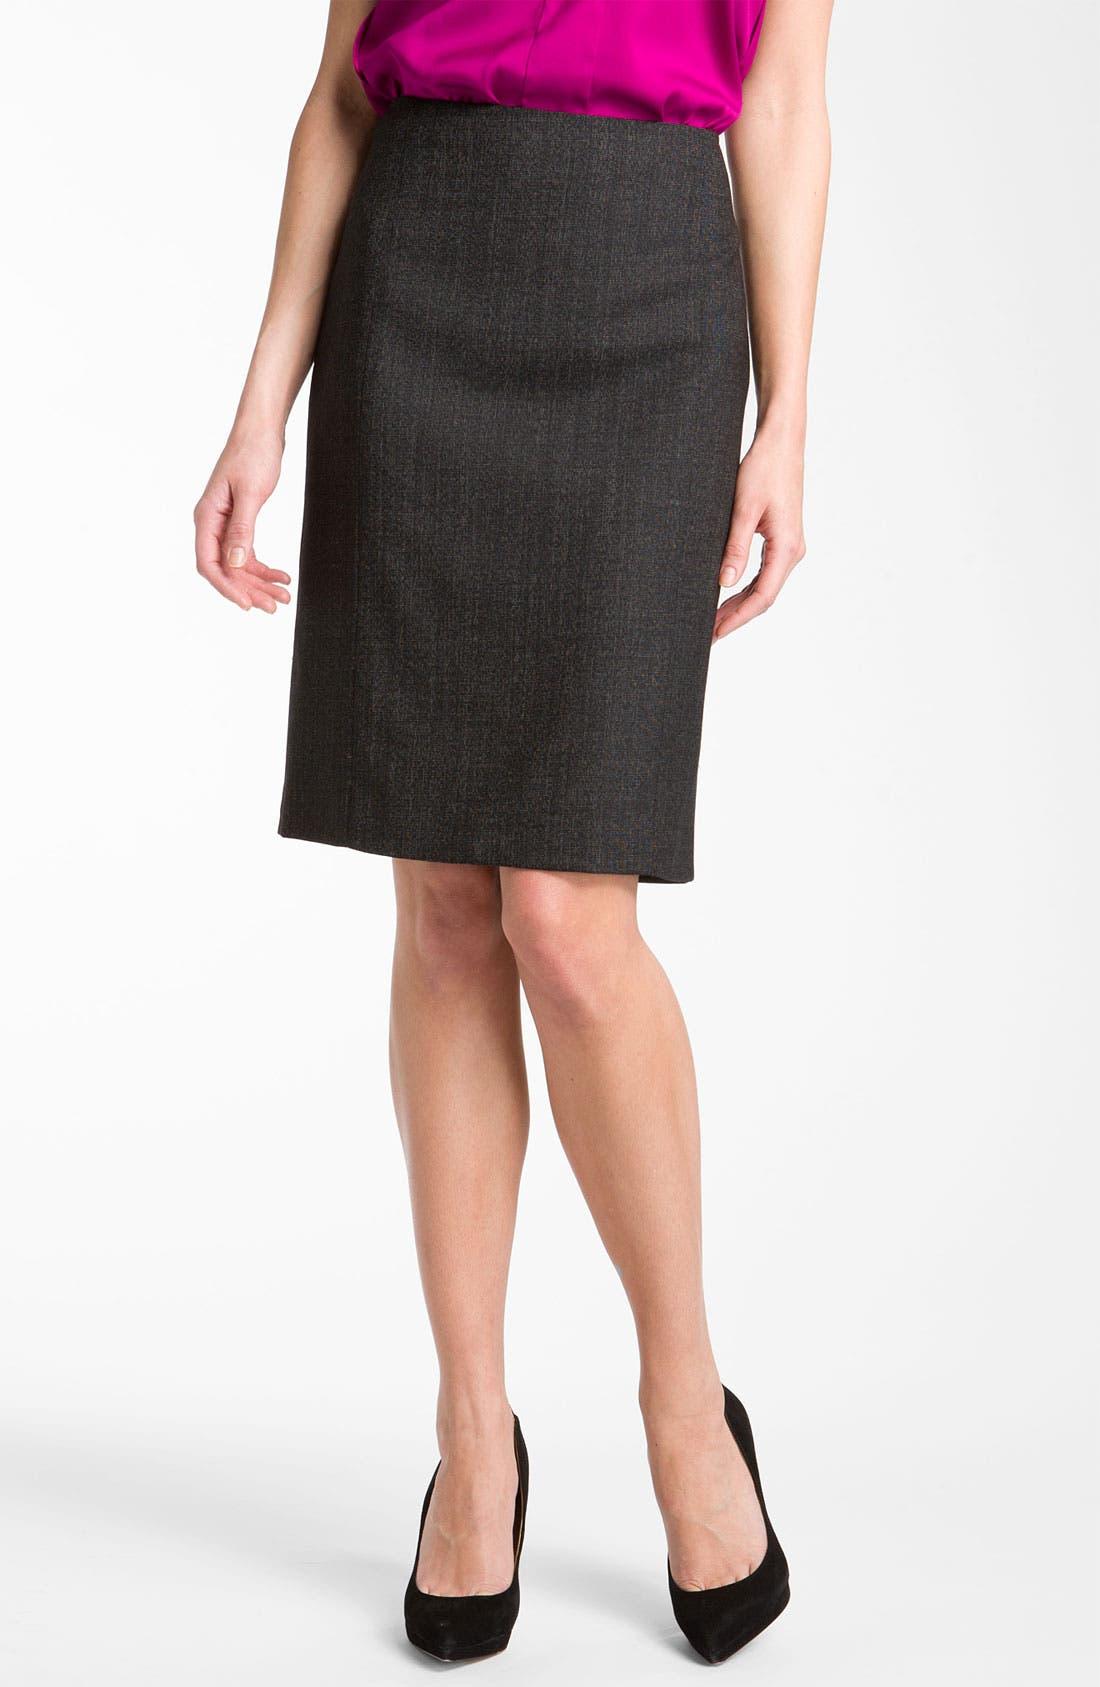 Alternate Image 1 Selected - Theory 'Cegilia - Copenhagen' Pencil Skirt